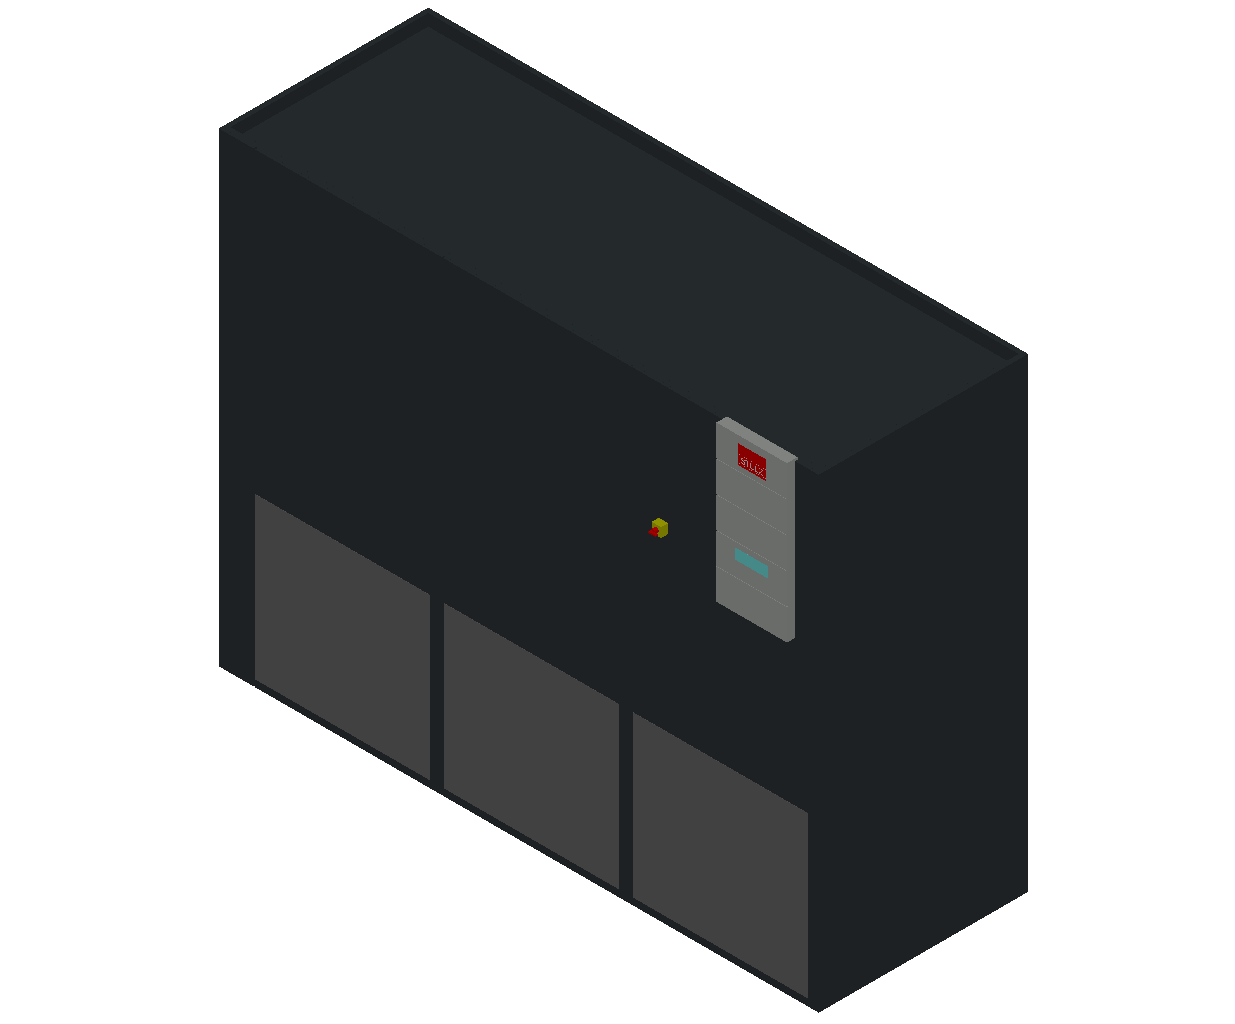 HC_Air Conditioner_Indoor Unit_MEPcontent_STULZ_CyberAir 3PRO_ASU_CW_ASU_1560_CW_INT-EN.dwg